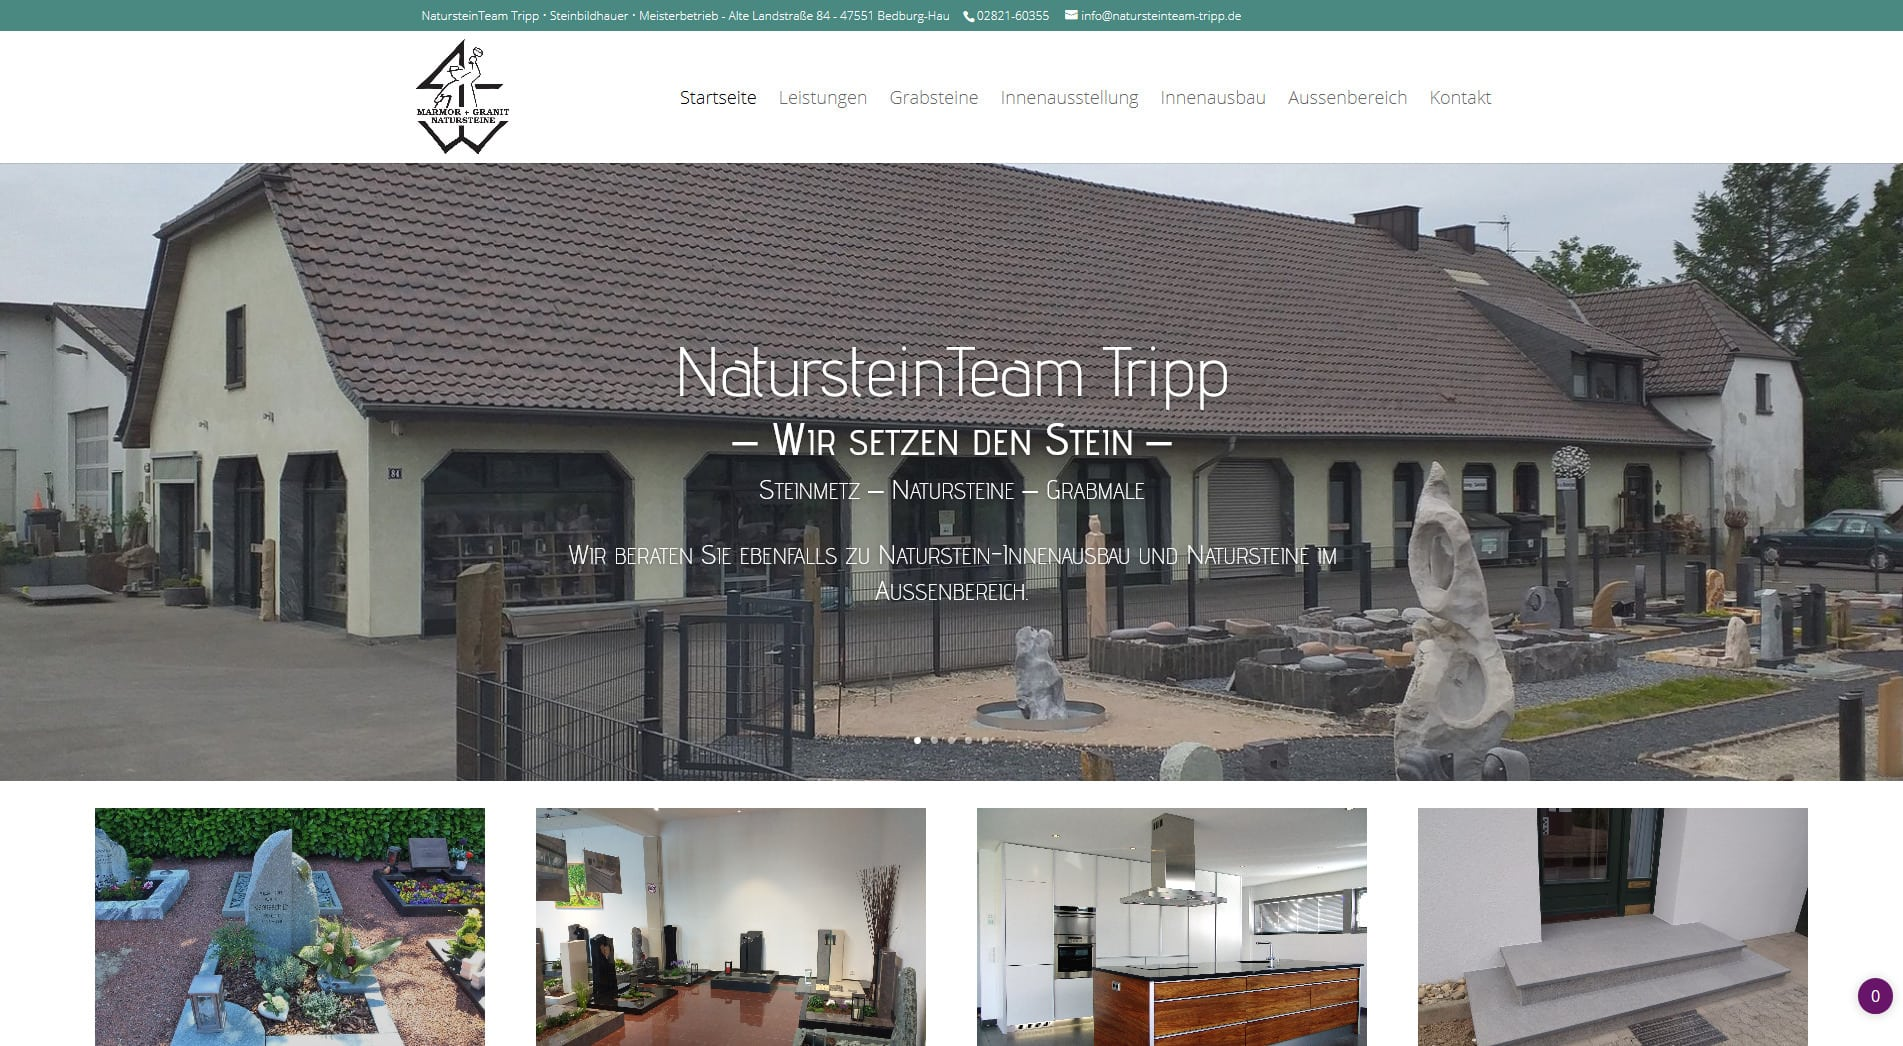 Webdesign Kleve TJWeb | Natursteinteam Tripp Bedburg-Hau